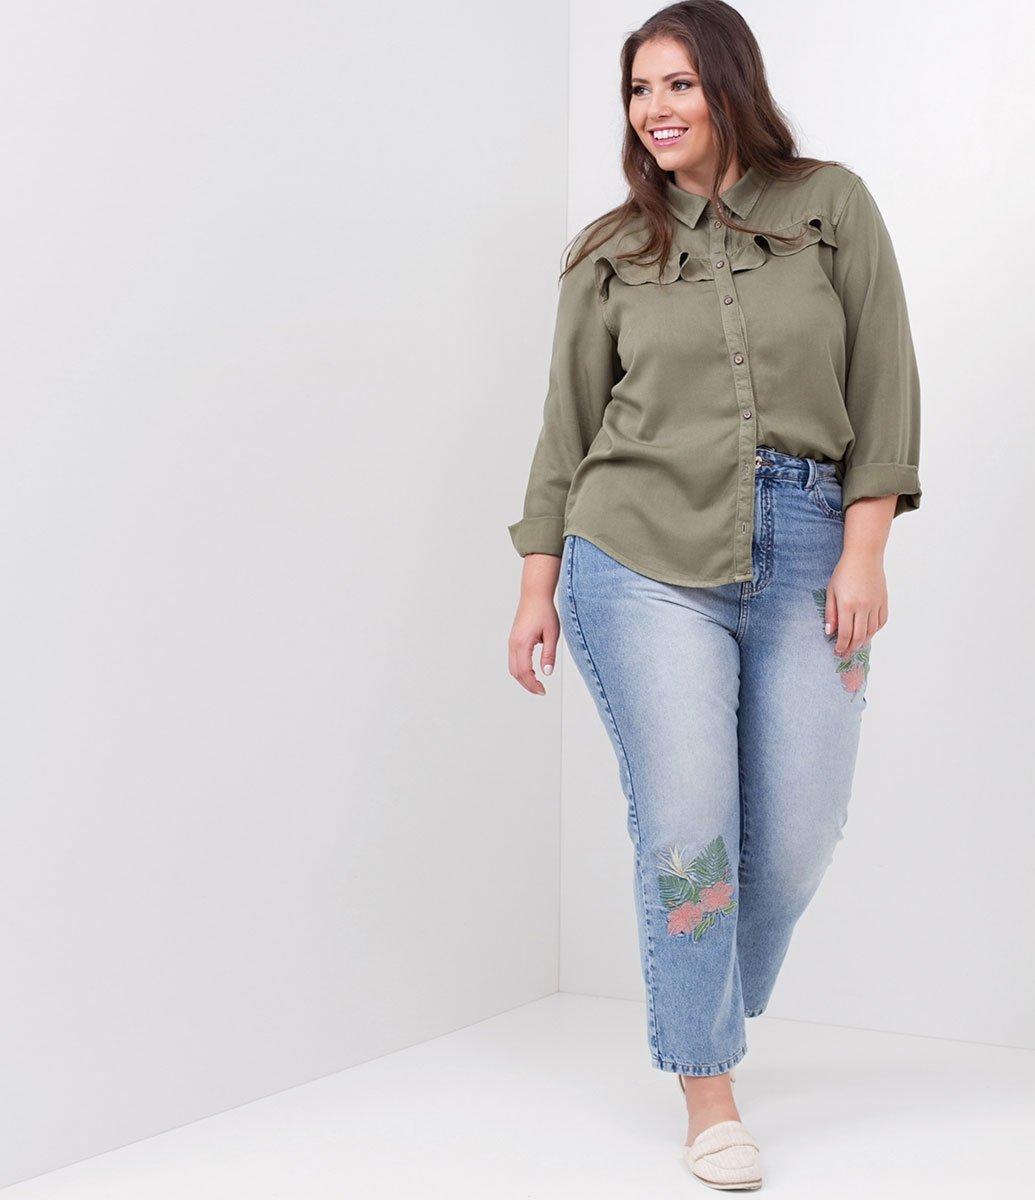 http://ad.zanox.com/ppc/?41561336C21262712&ULP=[[/p/calca-jeans-curve-plus-size-com-bordados-544624145-544624153?utm_source=zanox&utm_medium=afiliados]]